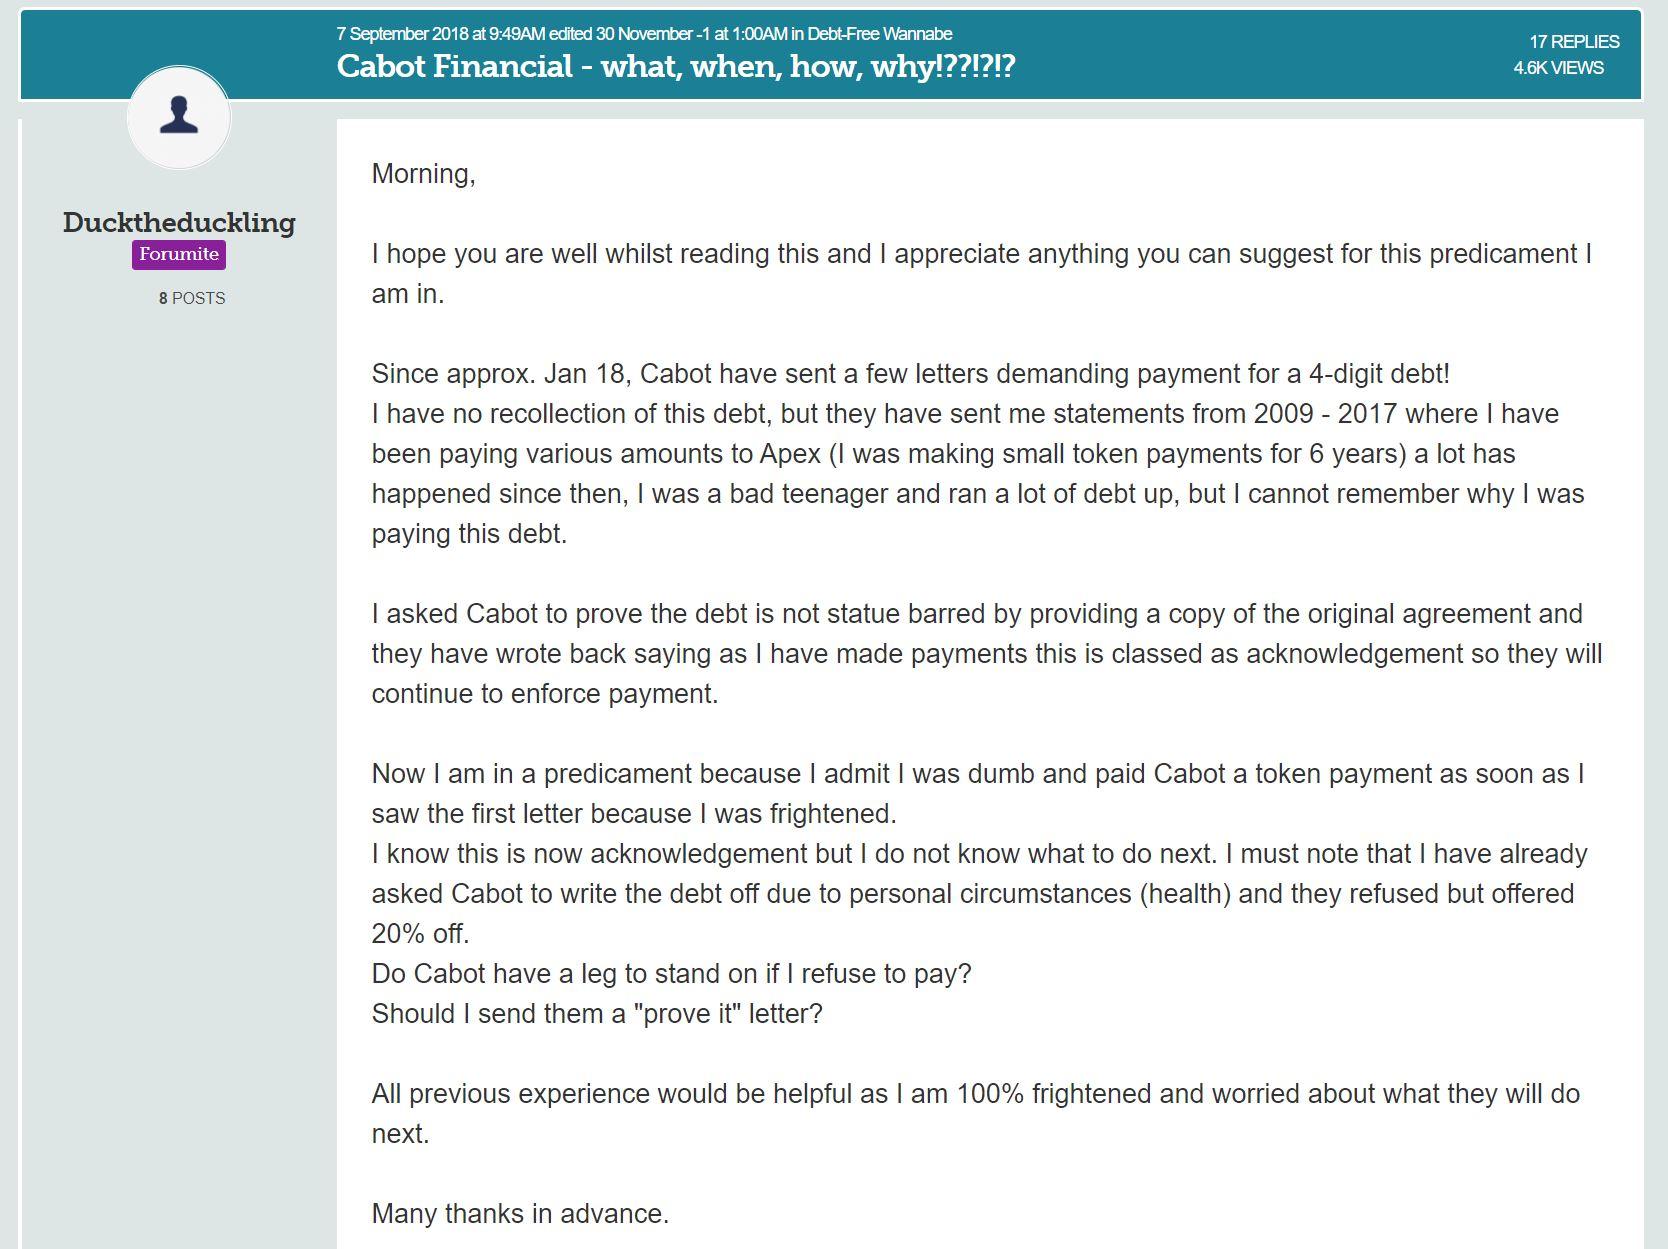 cabot financial debt forum img